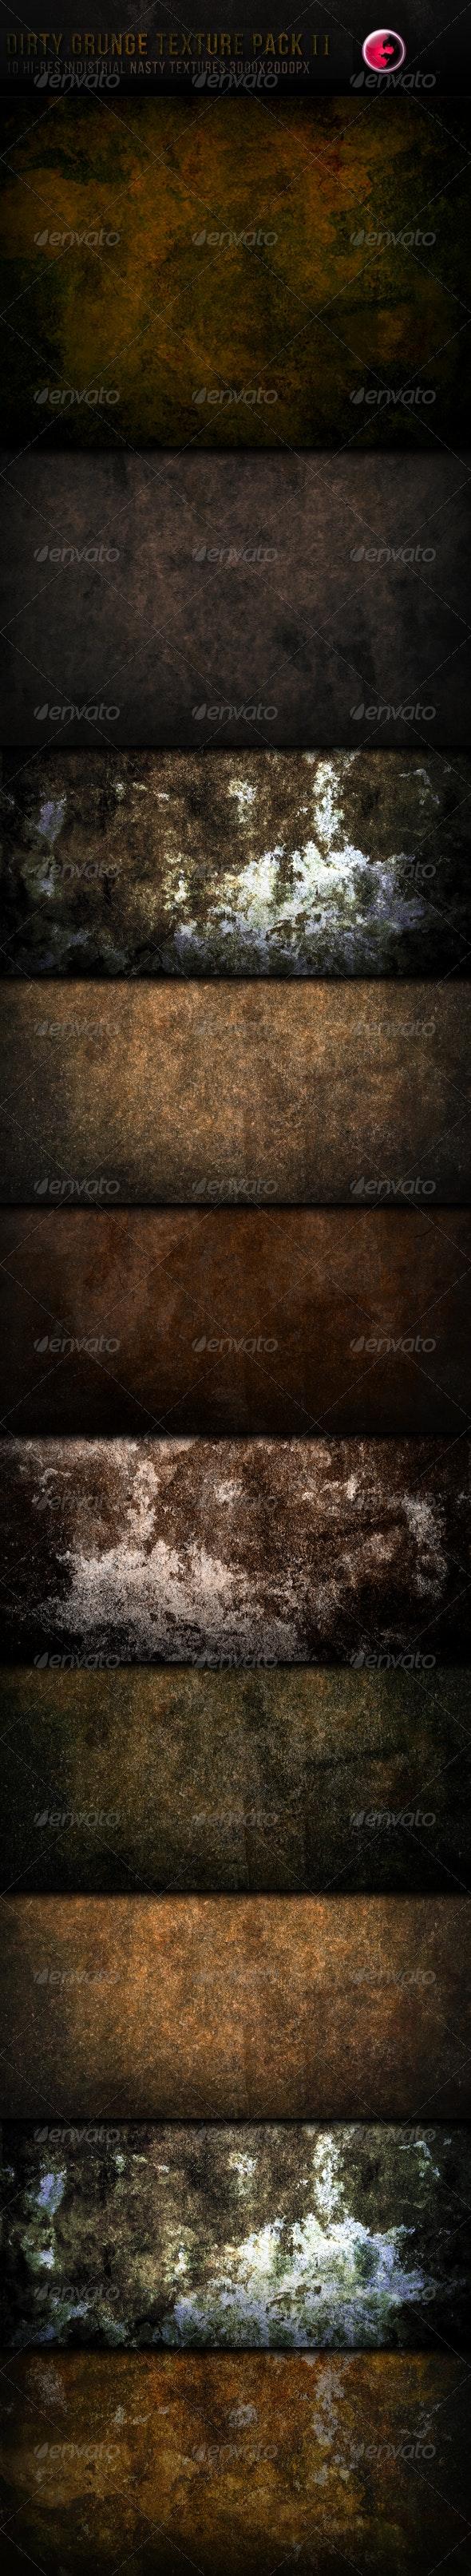 10Hi-Res Dirty grunge texture pack-ii - Industrial / Grunge Textures